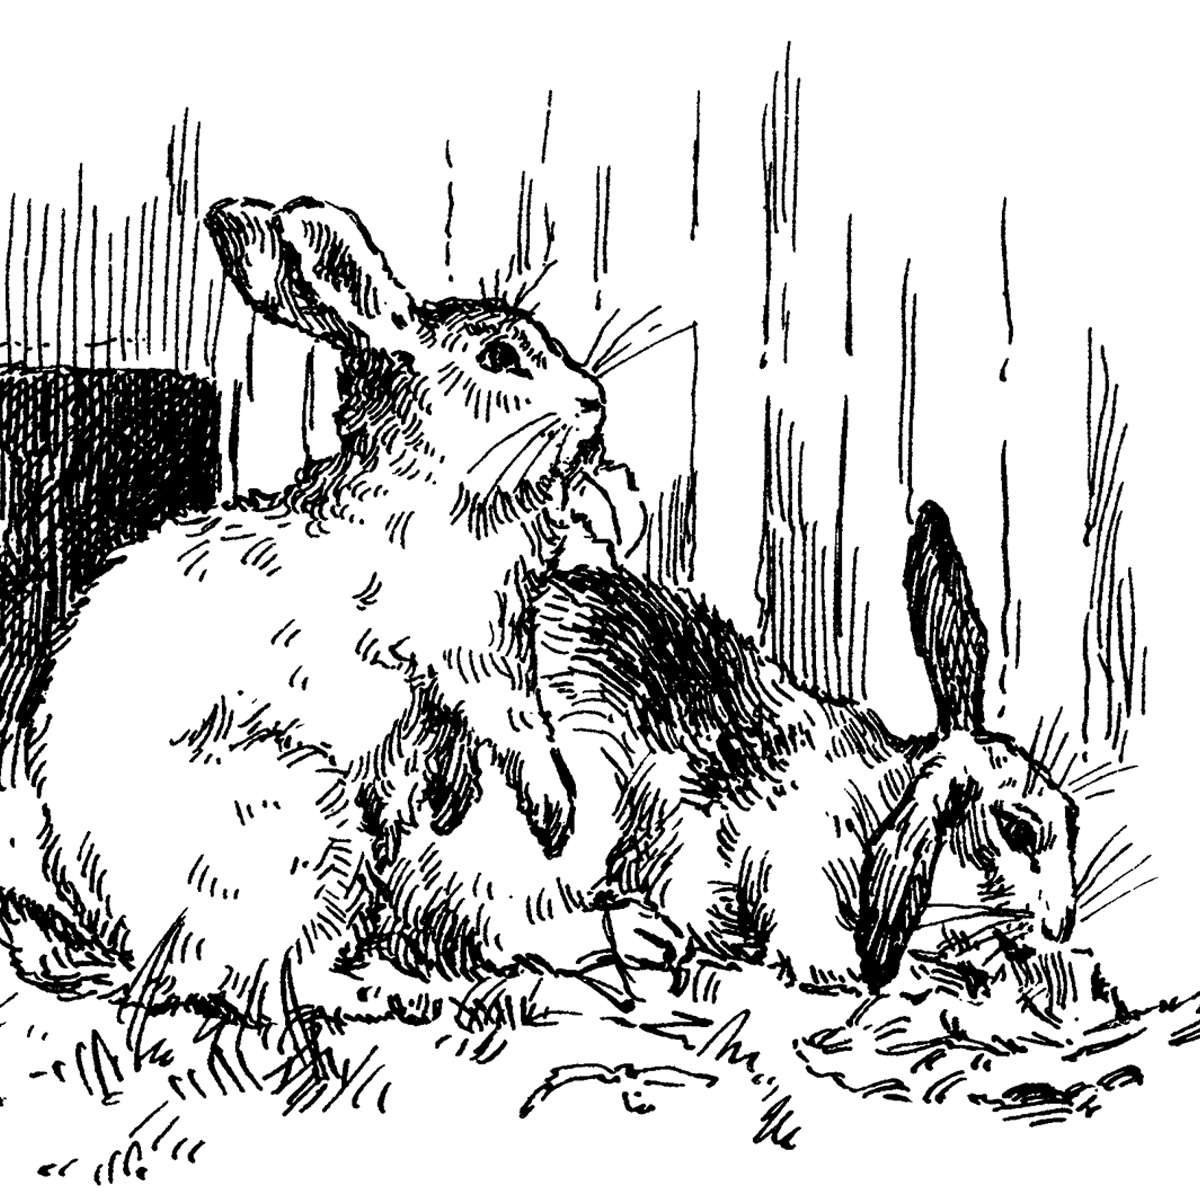 Free Vintage Clip Art Bunny Rabbits